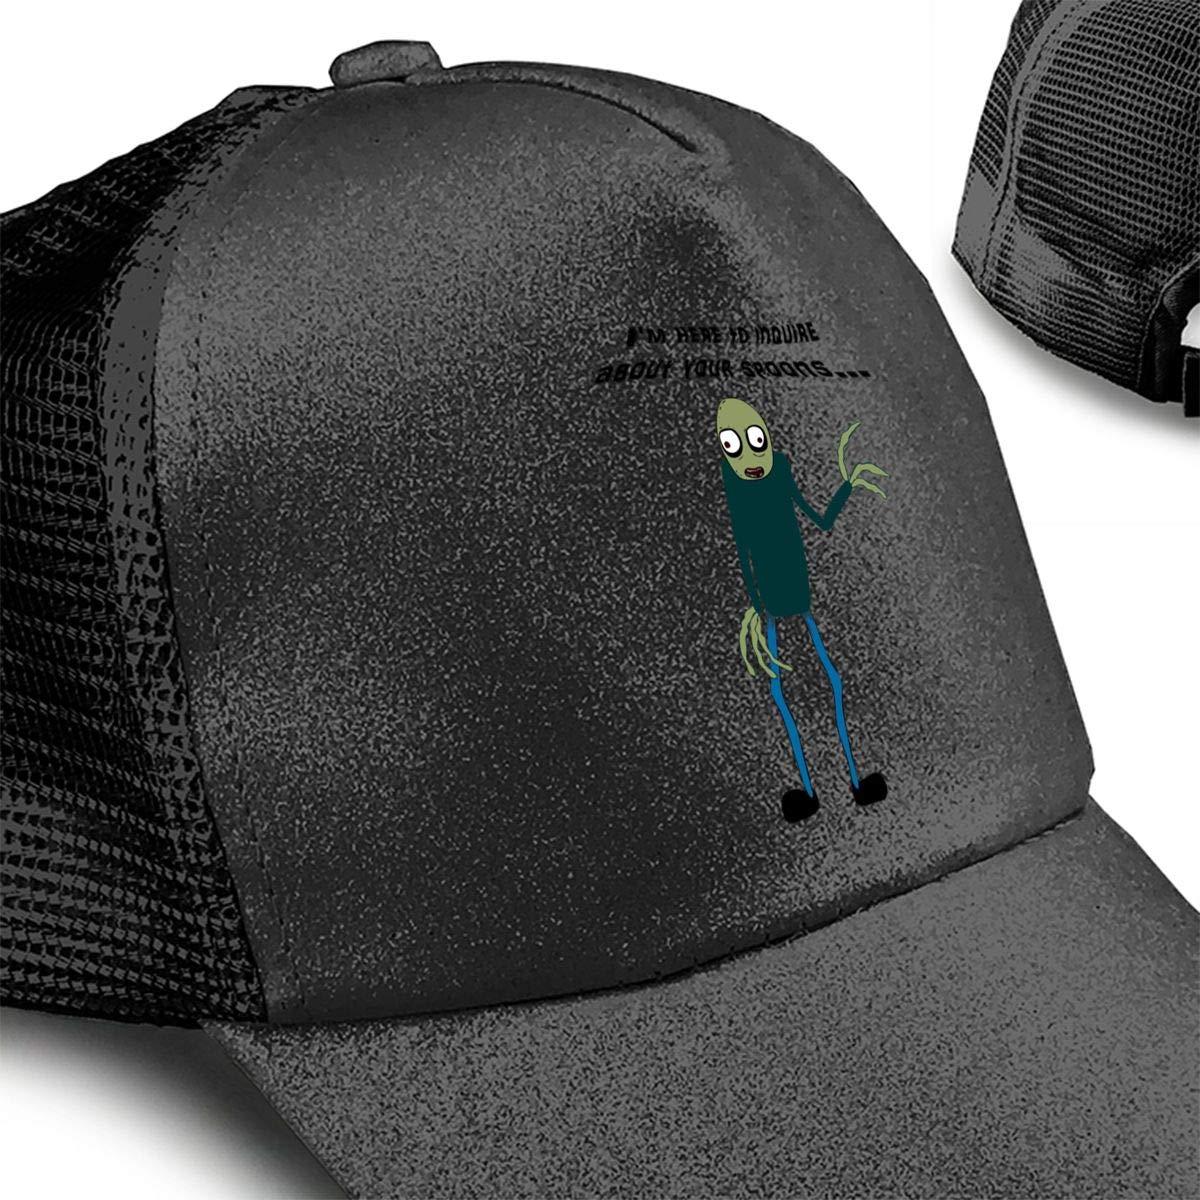 Salad Fingers Ponytail Messy High Bun Hat Ponycaps Baseball Cap Adjustable Trucker Cap Mesh Cap